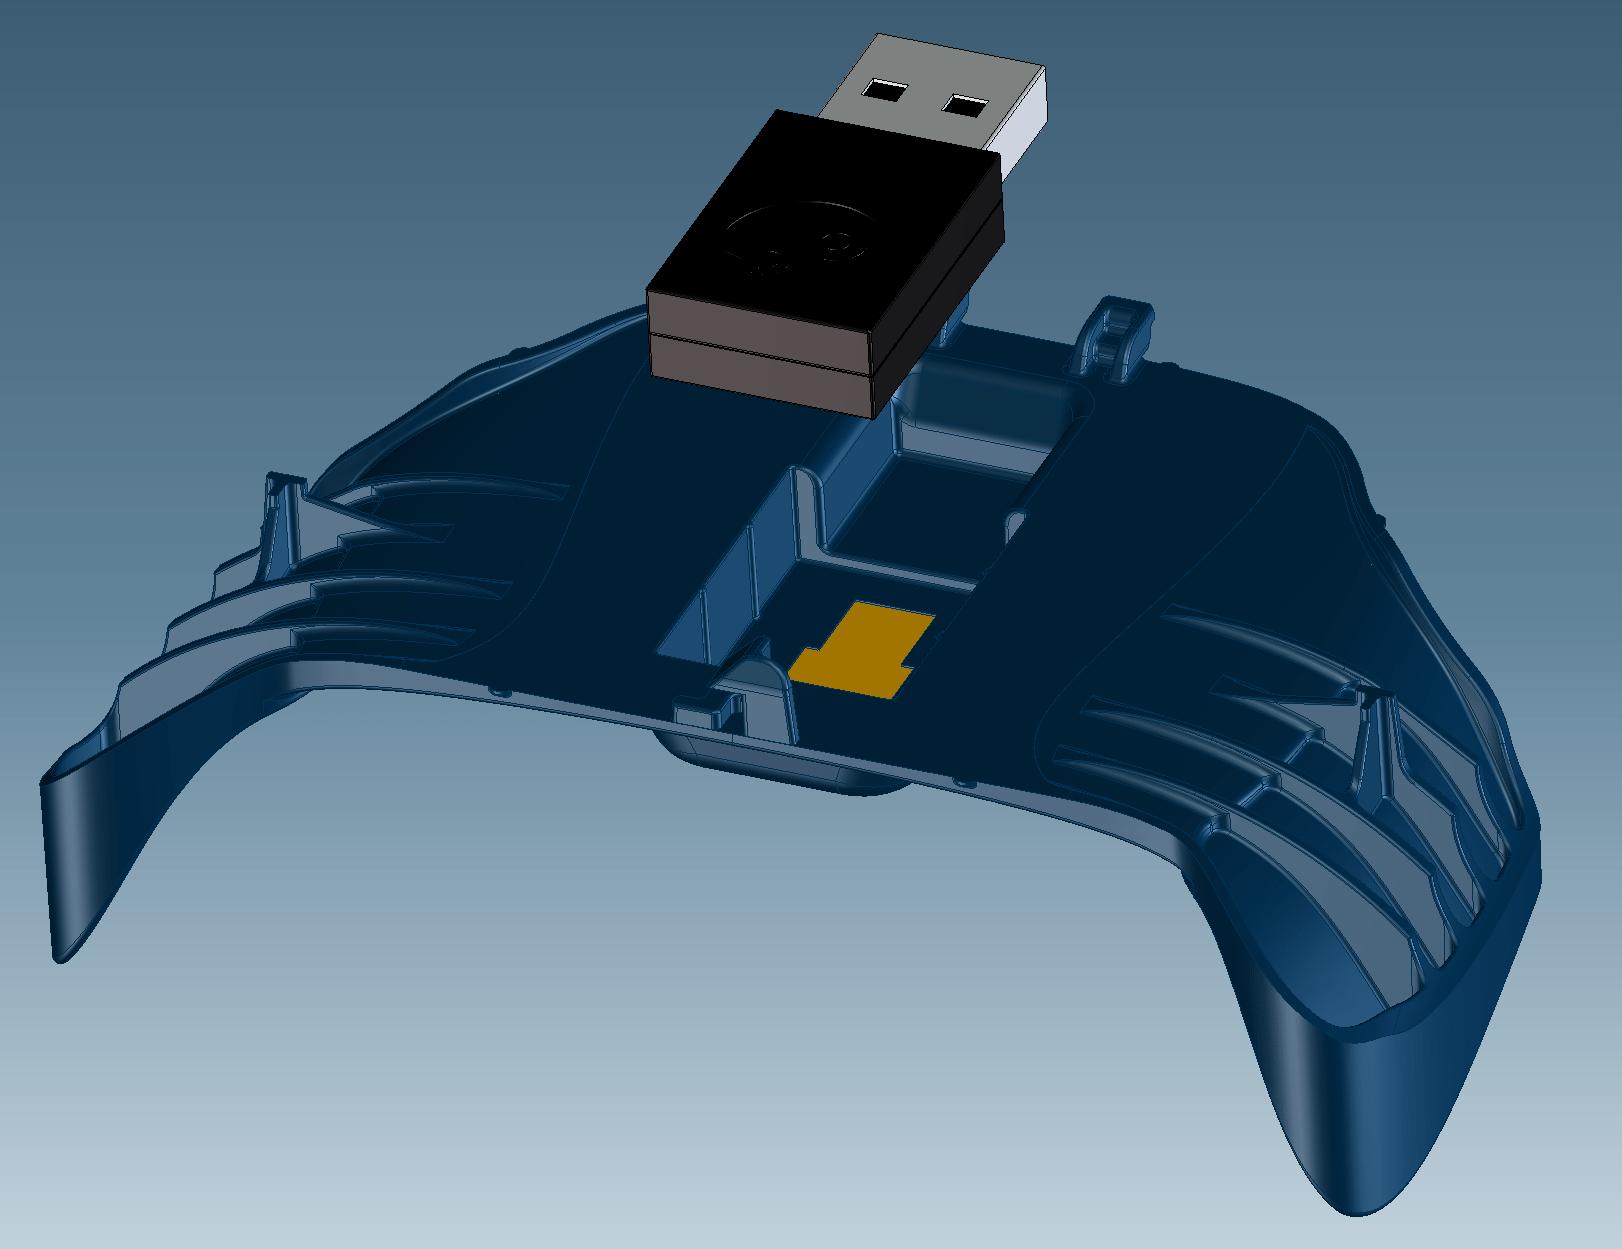 Steam Controller model